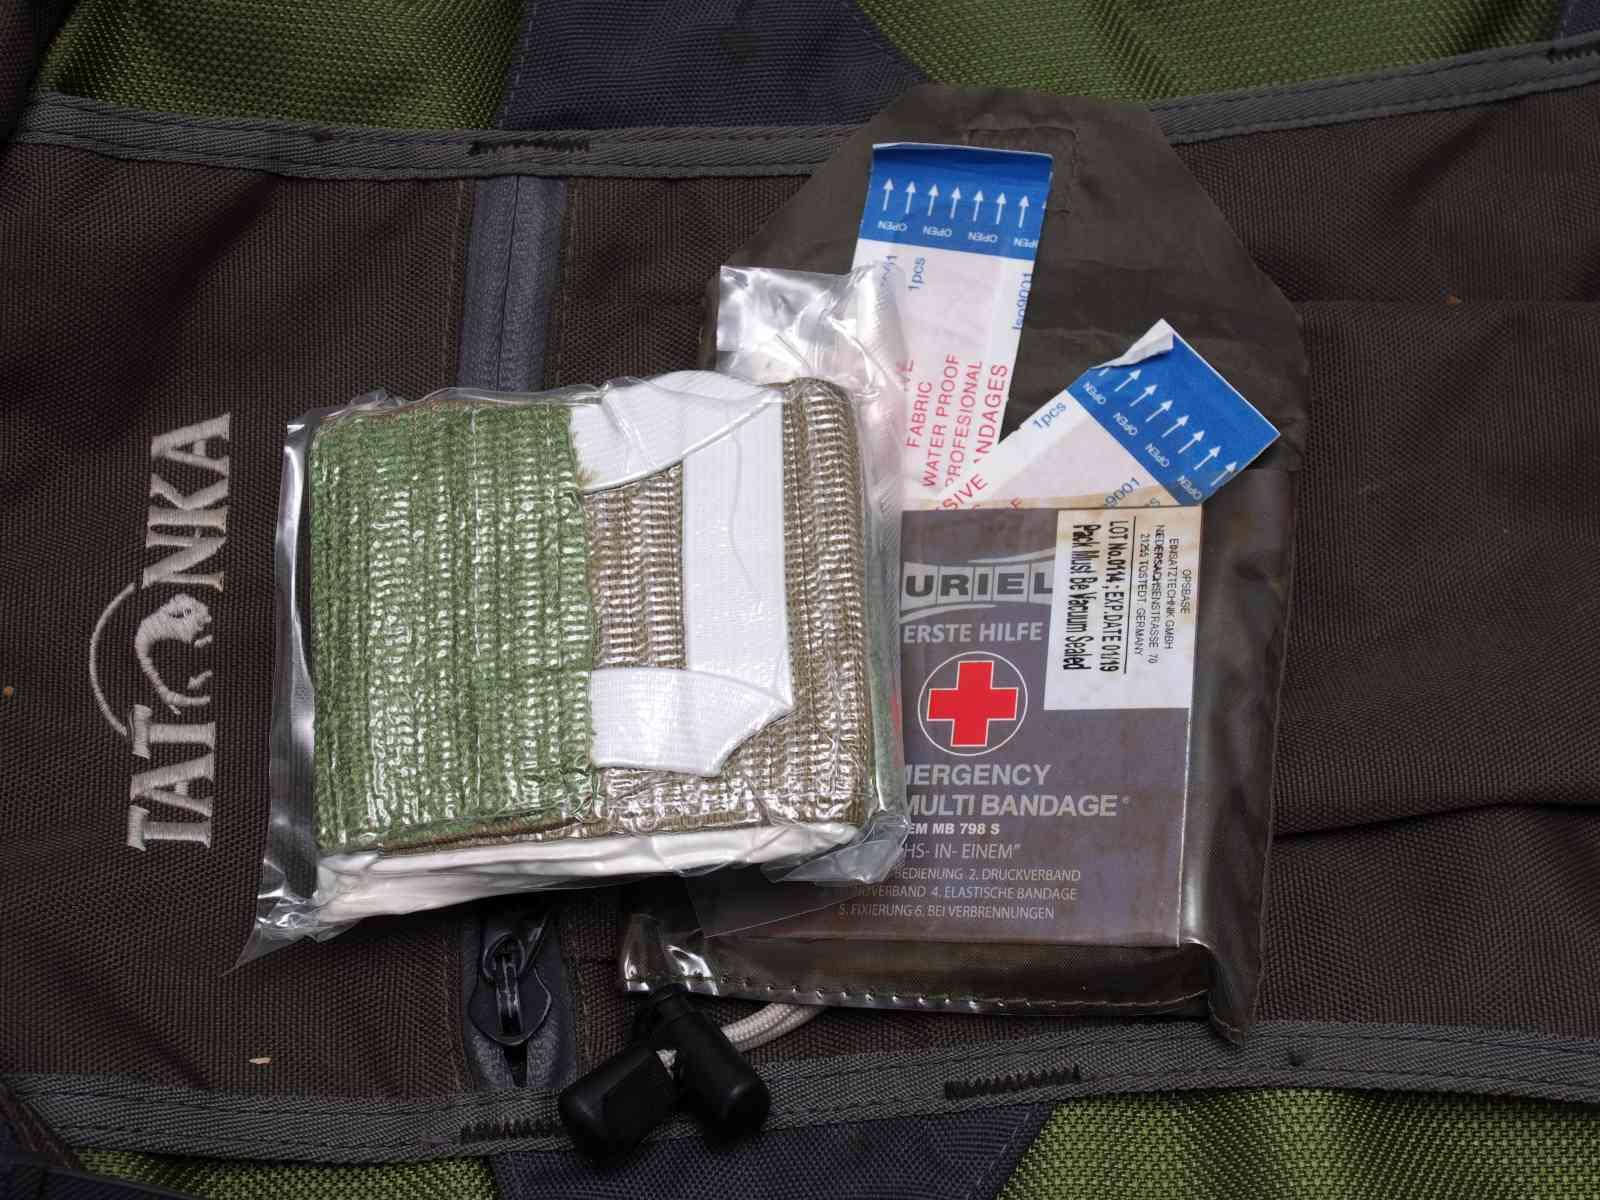 Mein Survival-Kit - Uriel